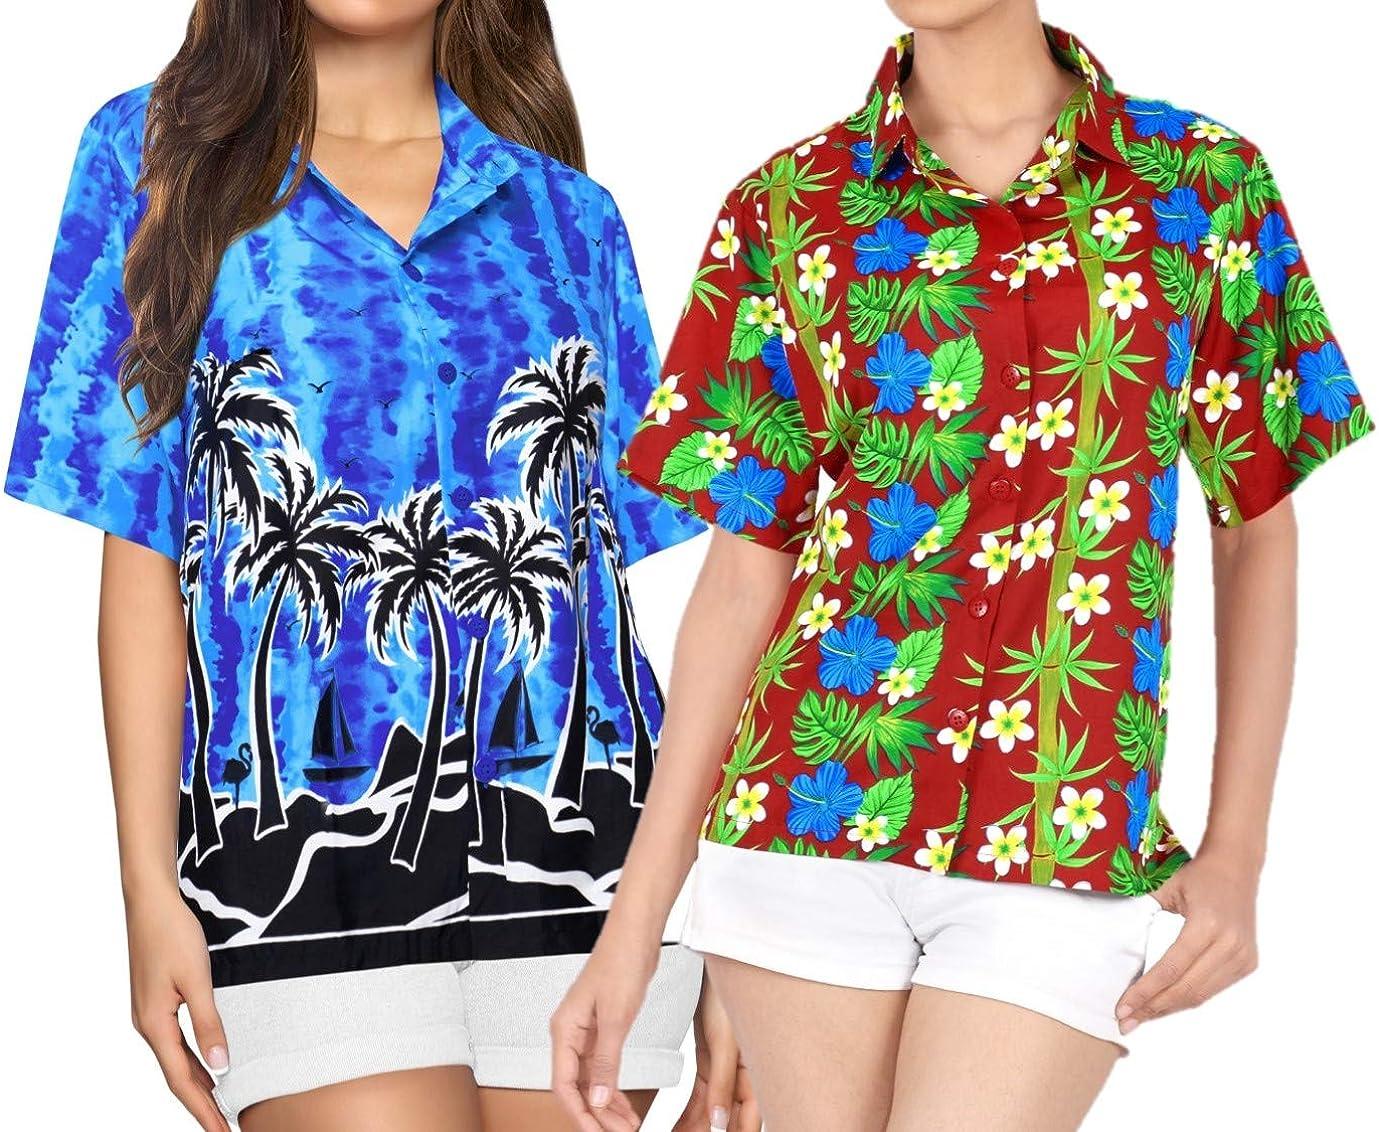 LA LEELA Women's High order Popular overseas Hawaiian Blouse S Nightwear Shirt Sleeves Short